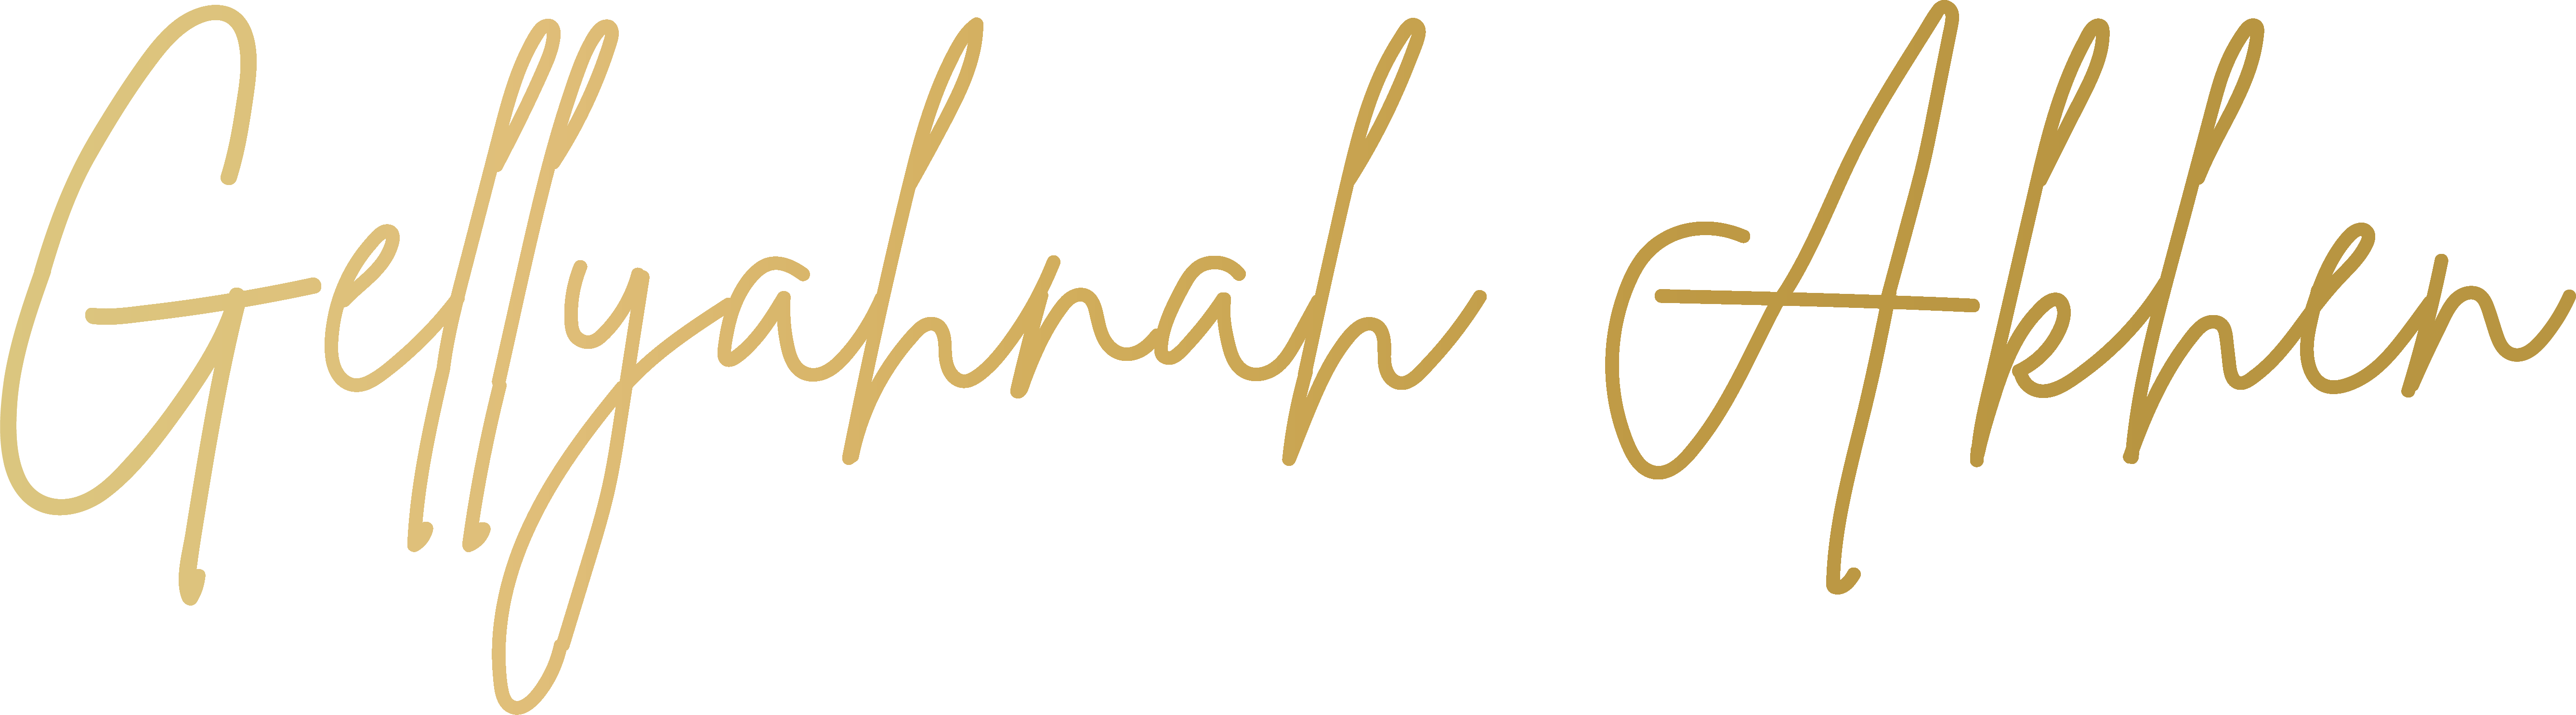 Gellyahnah_Logo